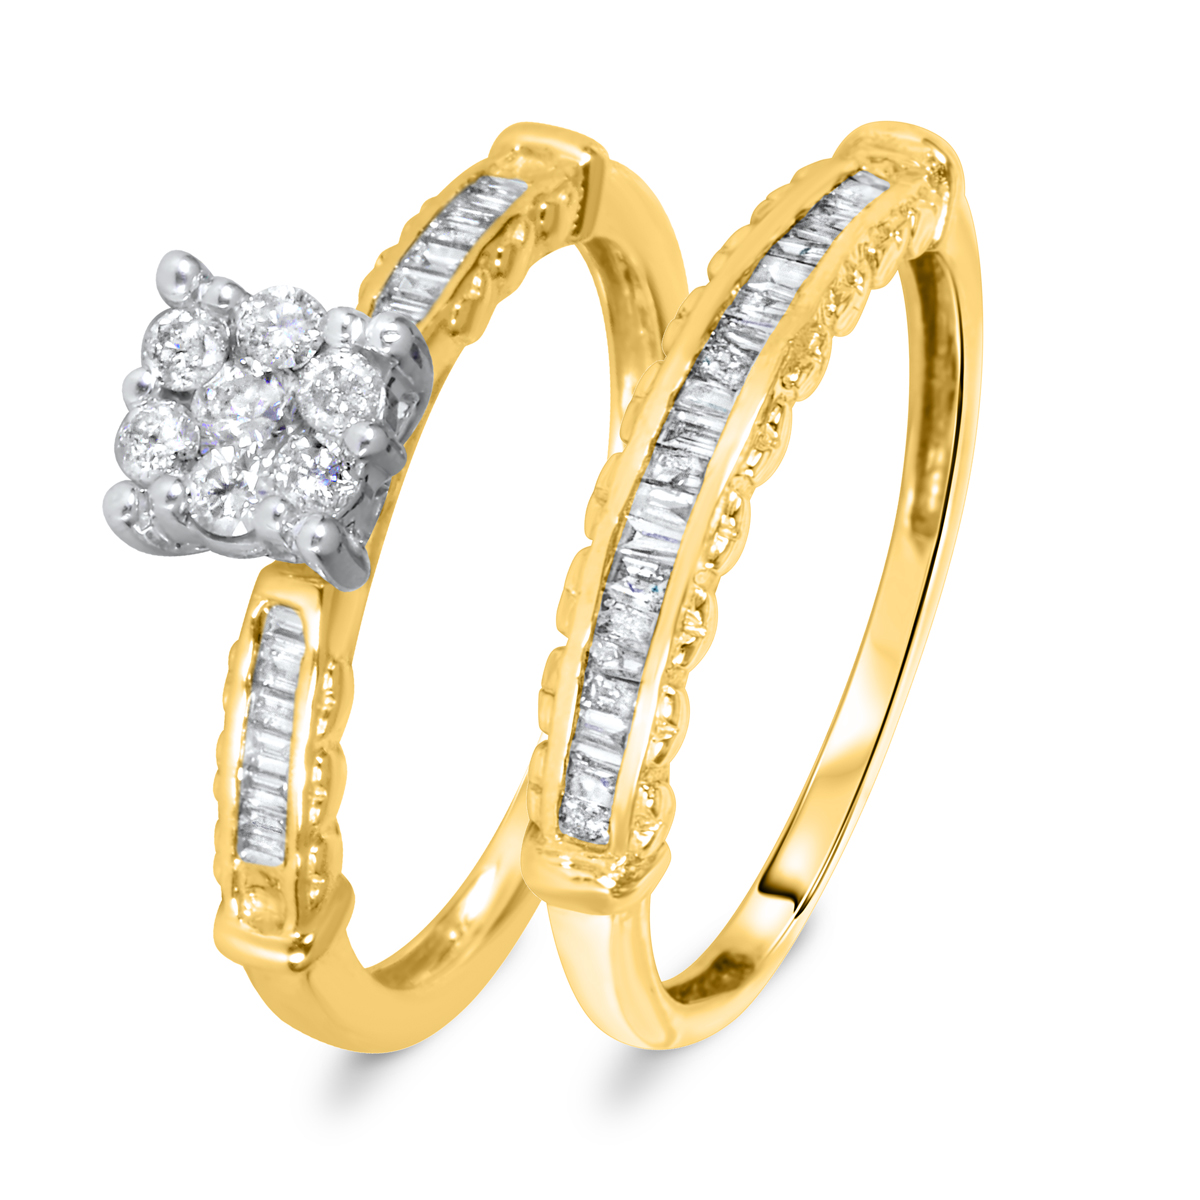 5/8 CT. T.W. Diamond Women's Bridal Wedding Ring Set 14K Yellow Gold